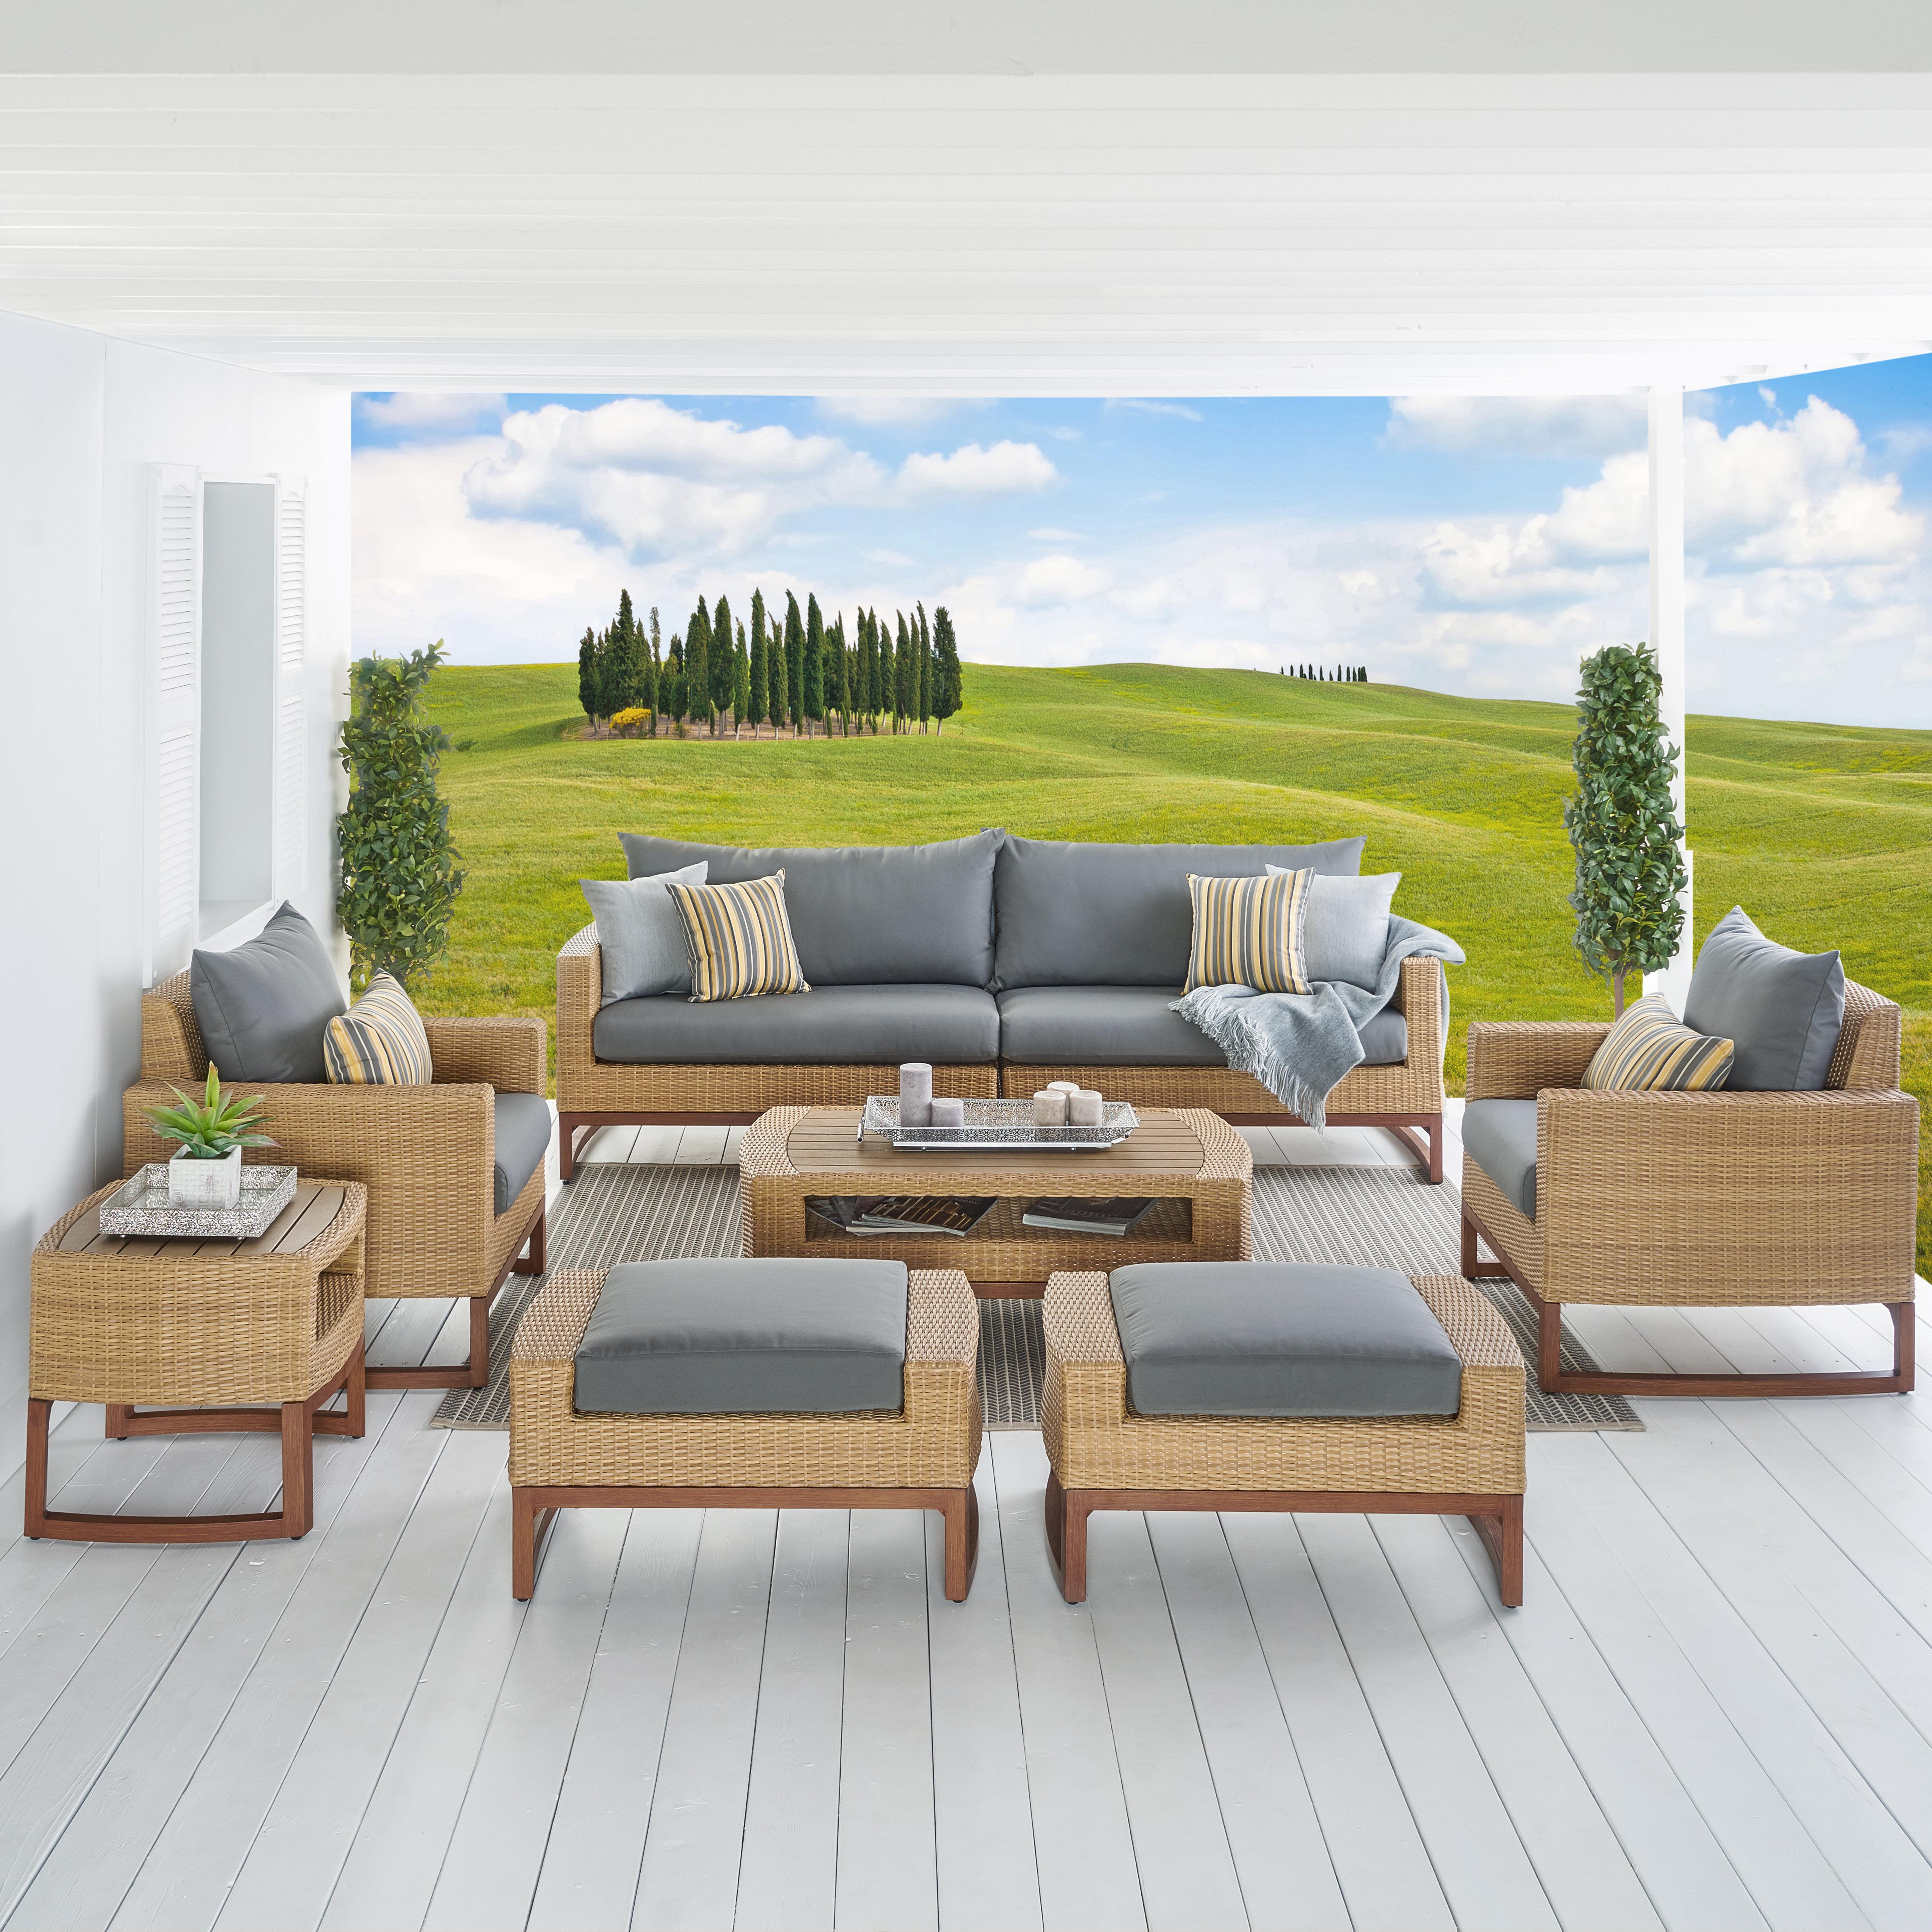 Mcdougal 7 Piece Sunbrella Sofa Seating Group With Cushions Reviews Birch Lane